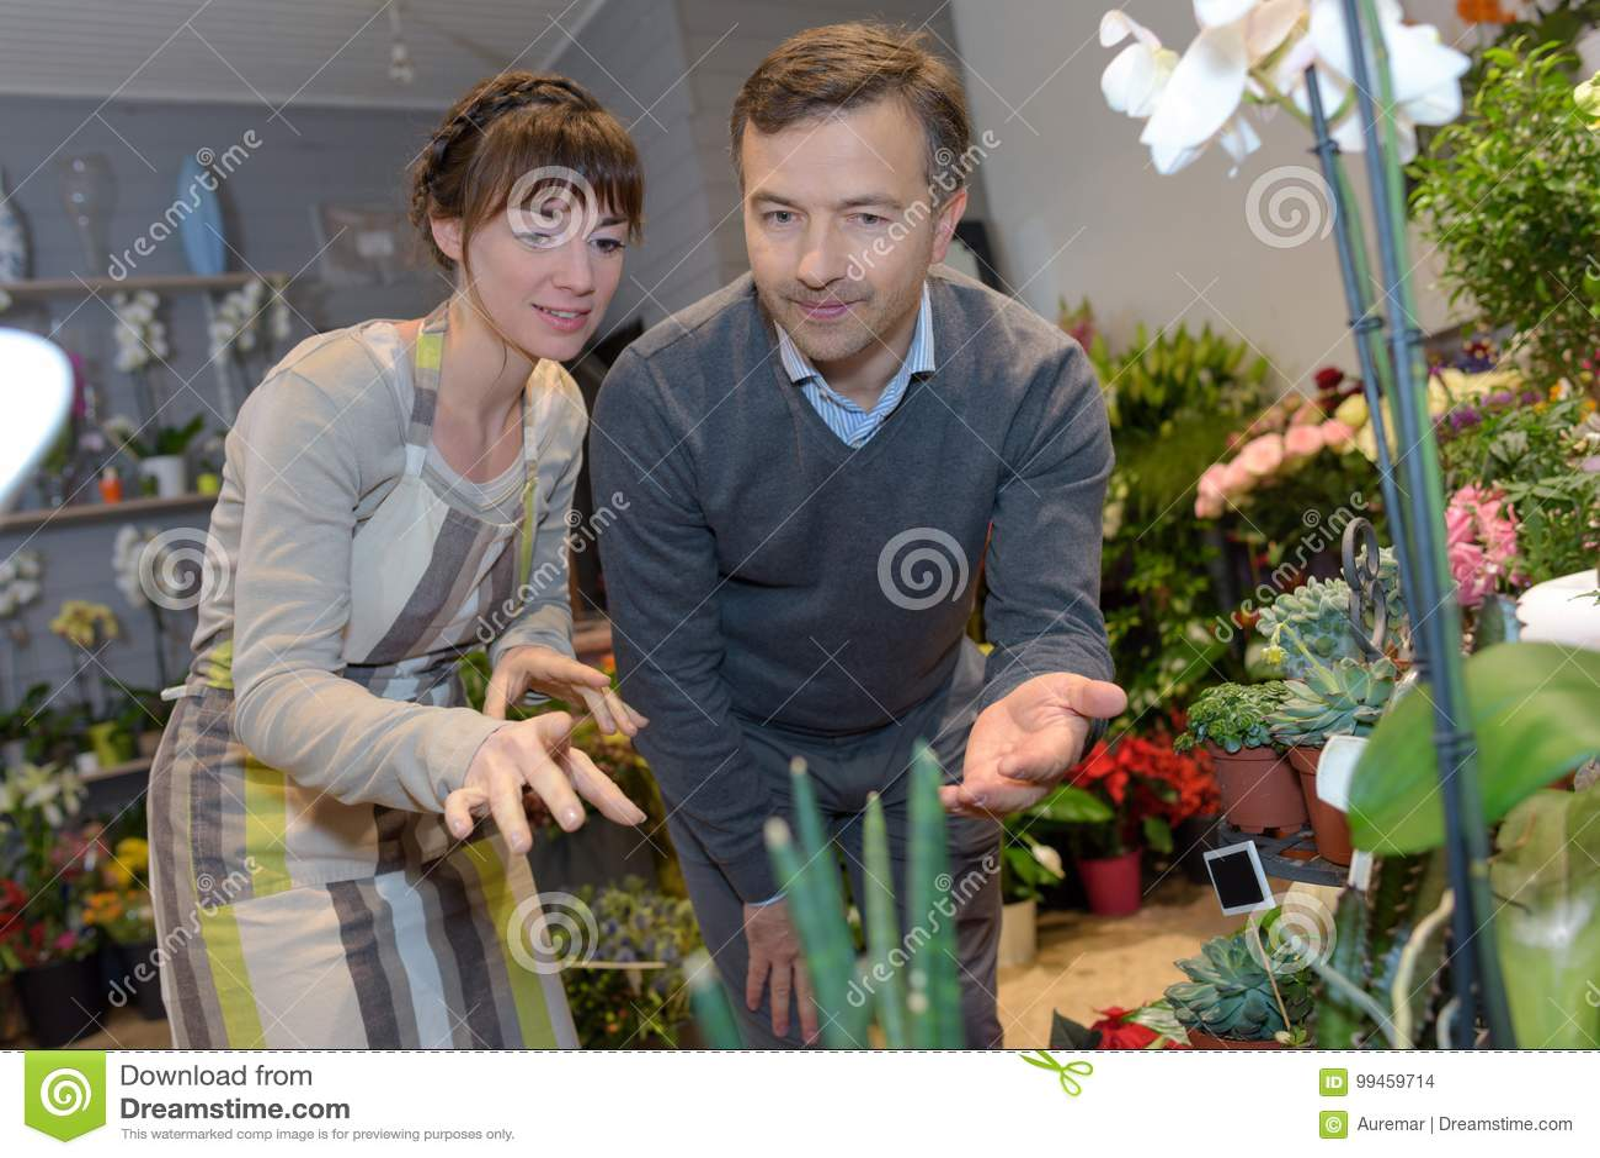 Man getting consultation in nursery shop from gardener